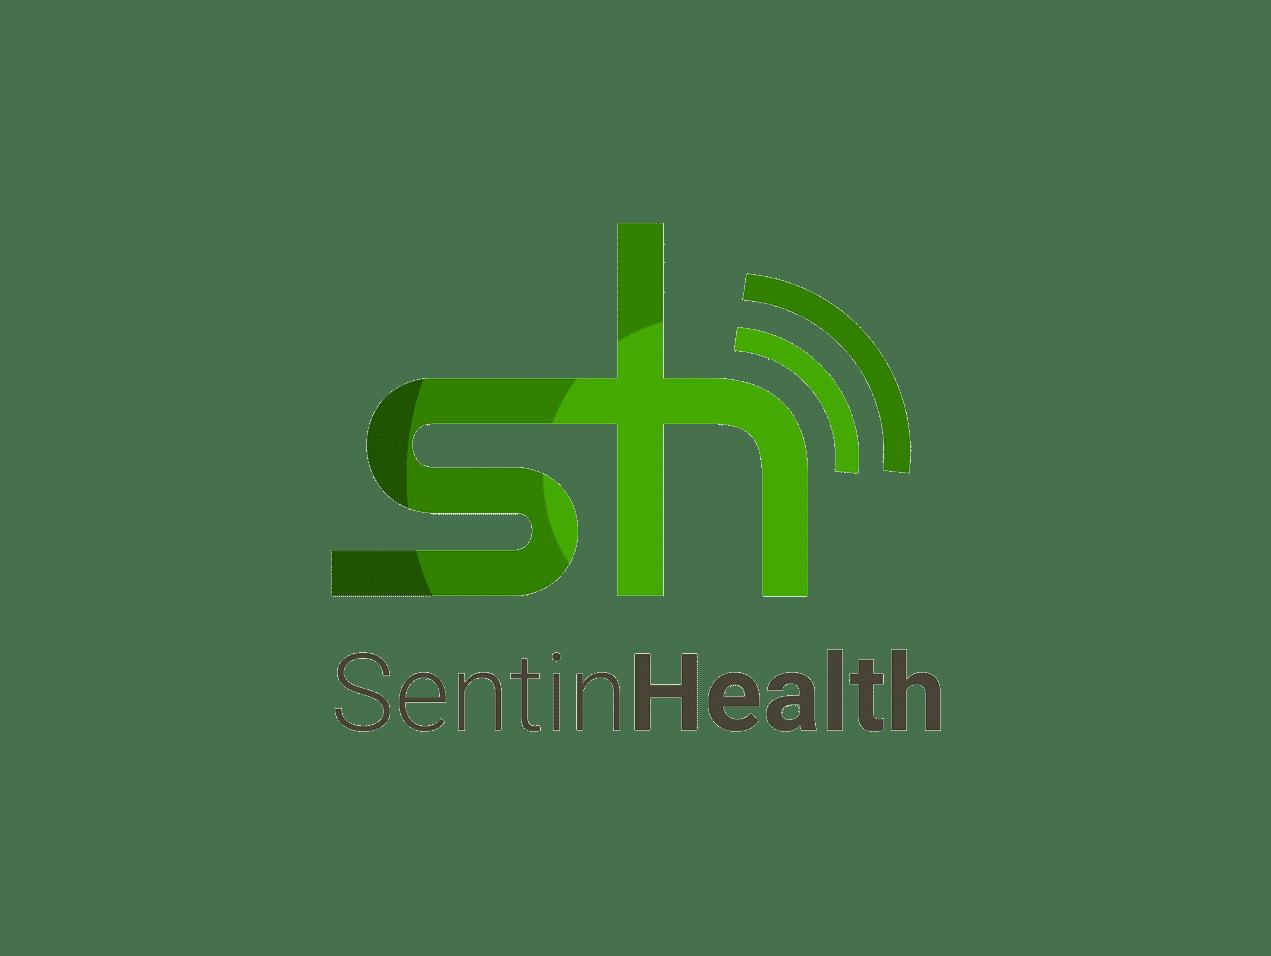 sentinhealth